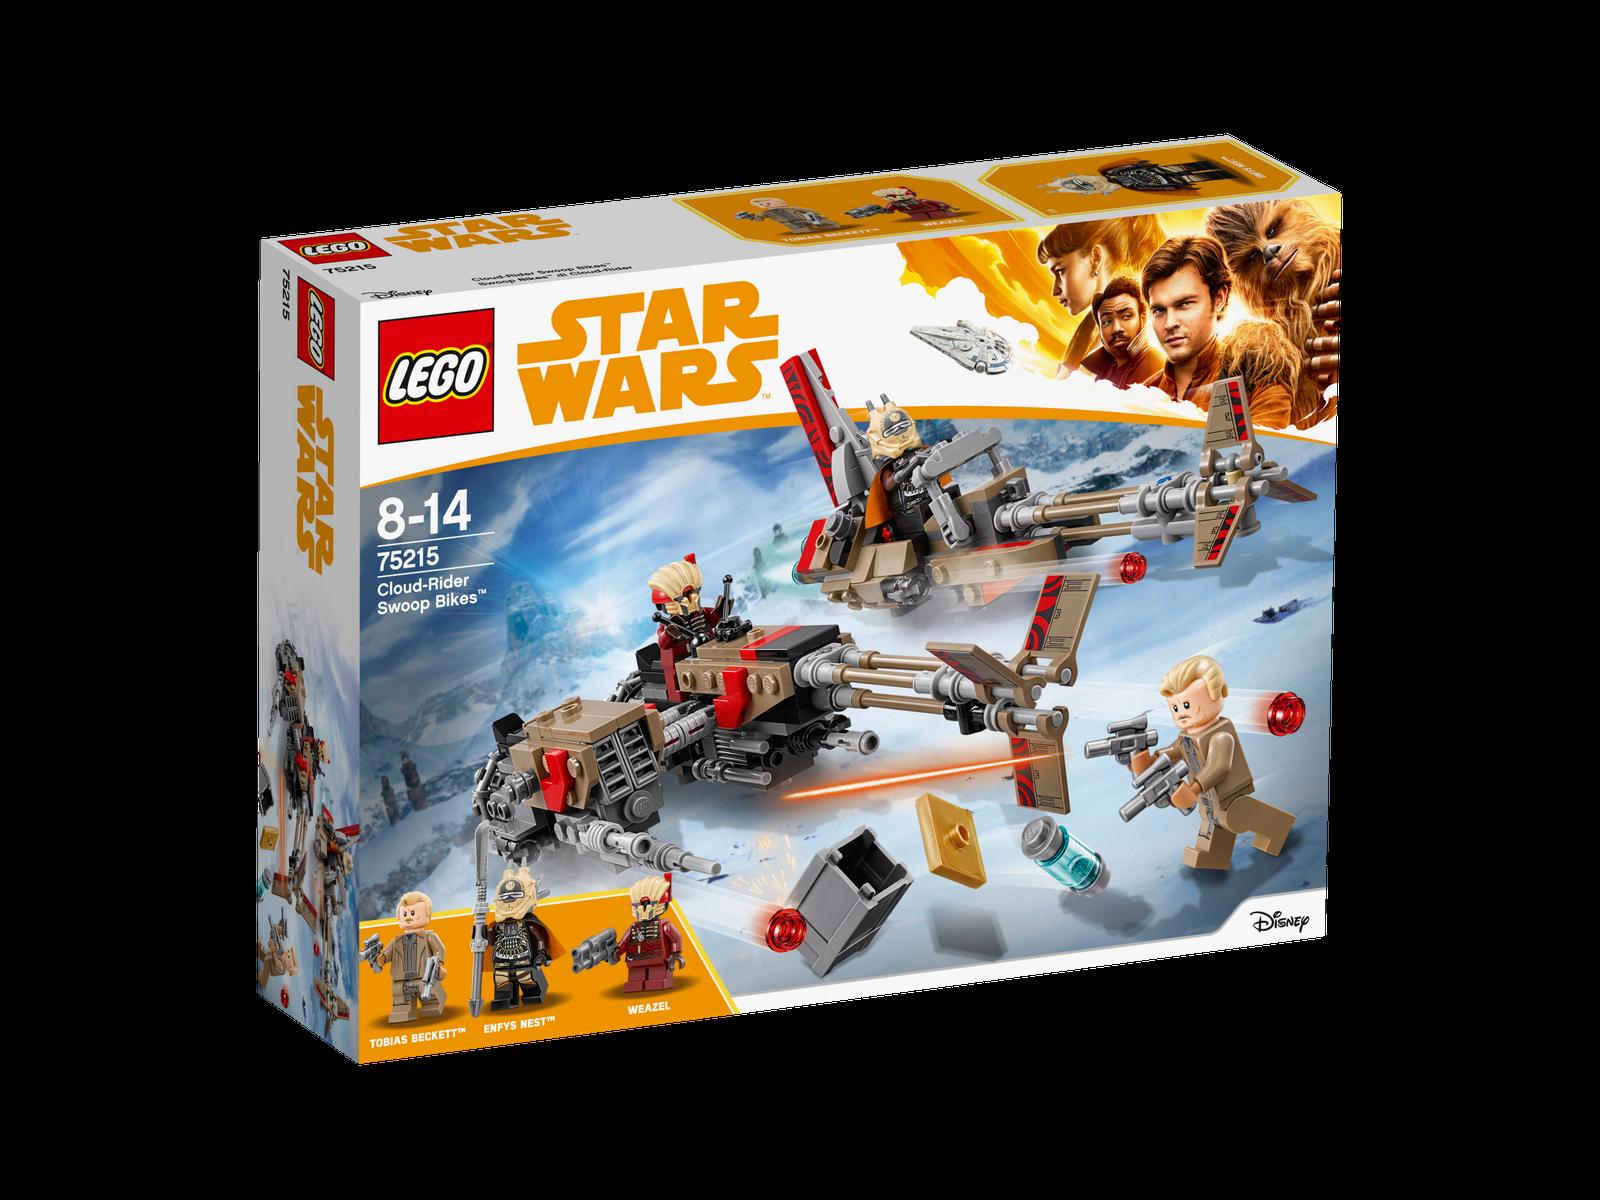 LEGO ® estrella guerras ™ 75215 Cloud-Rider  Swoop BIKES ™ NUOVO OVP nuovo MISB NRFB  garantito